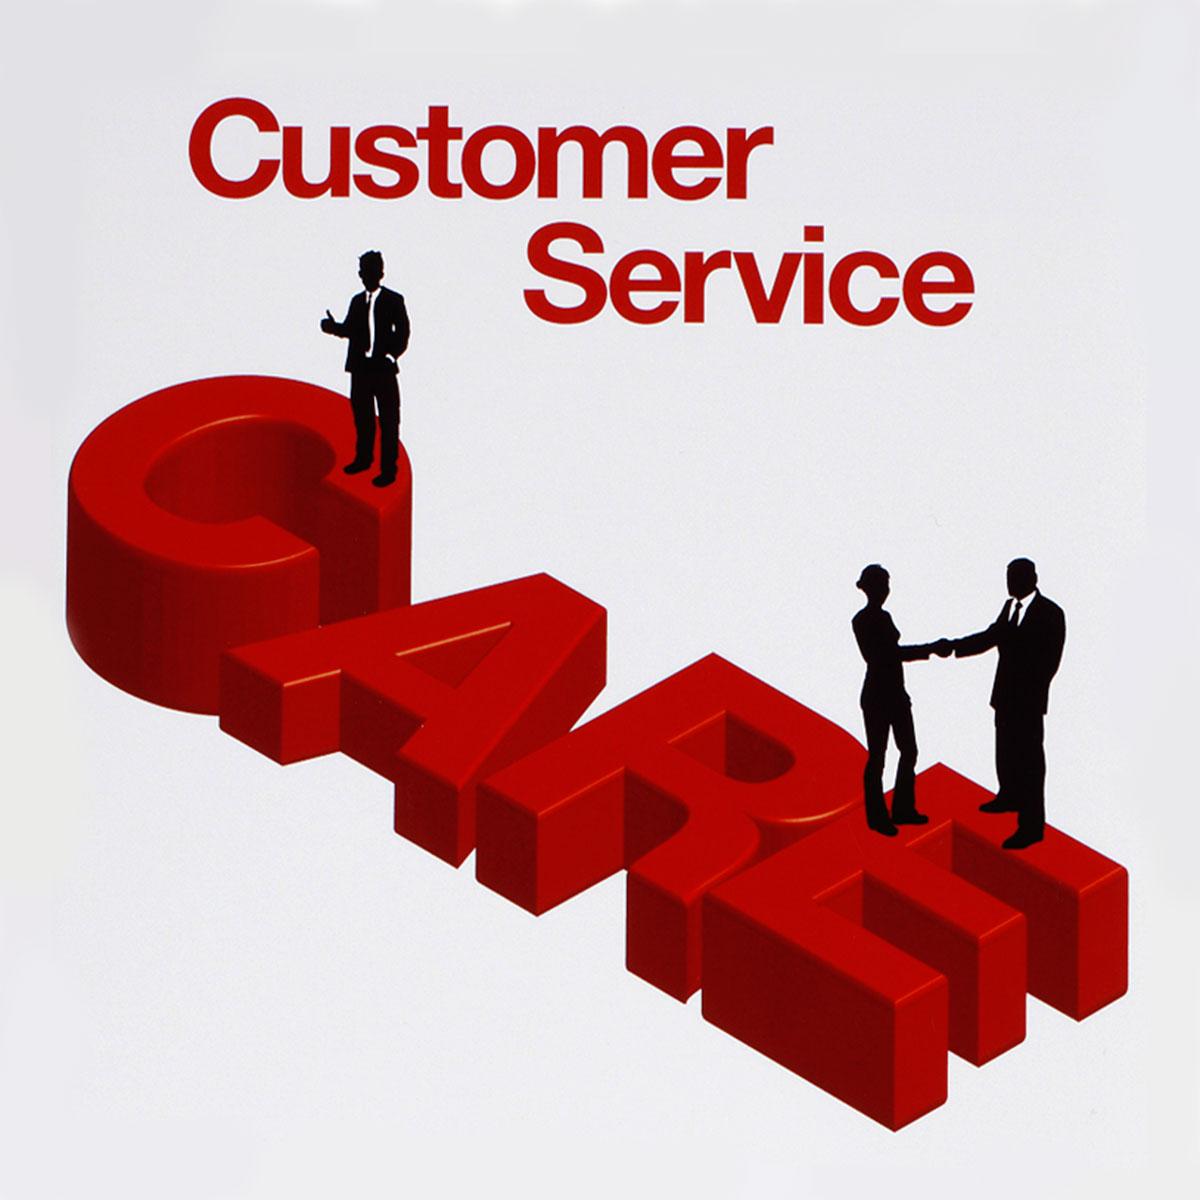 Customer Service Cards